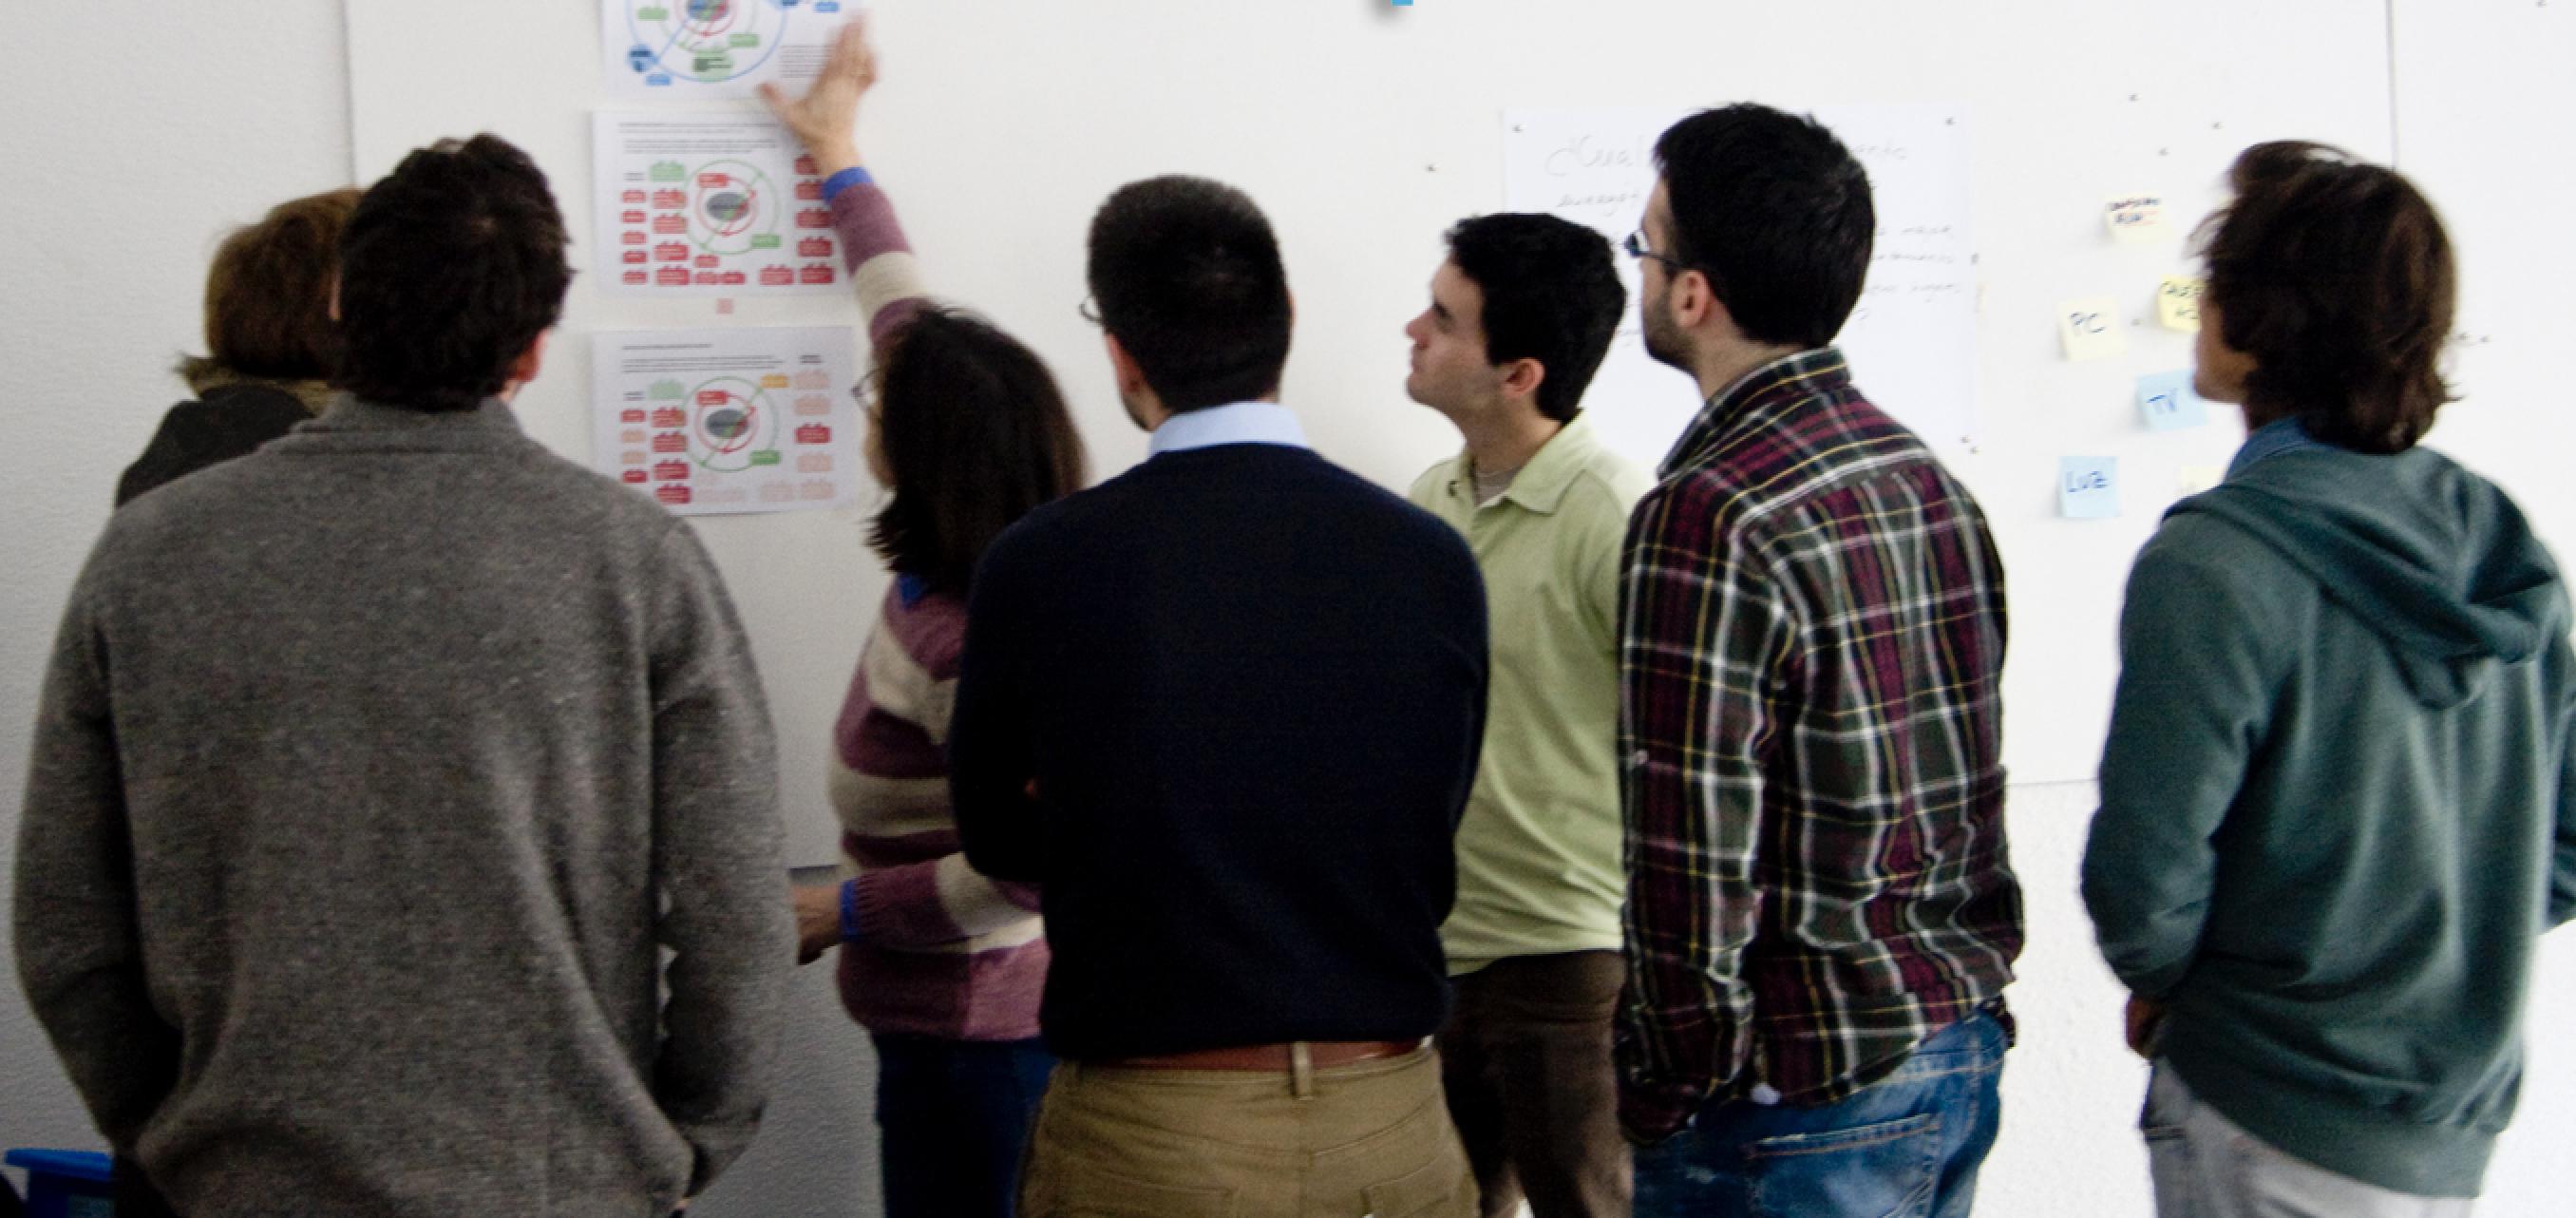 SmartEnergy rapid prototyping @openmarabunta [Orla De Diez]